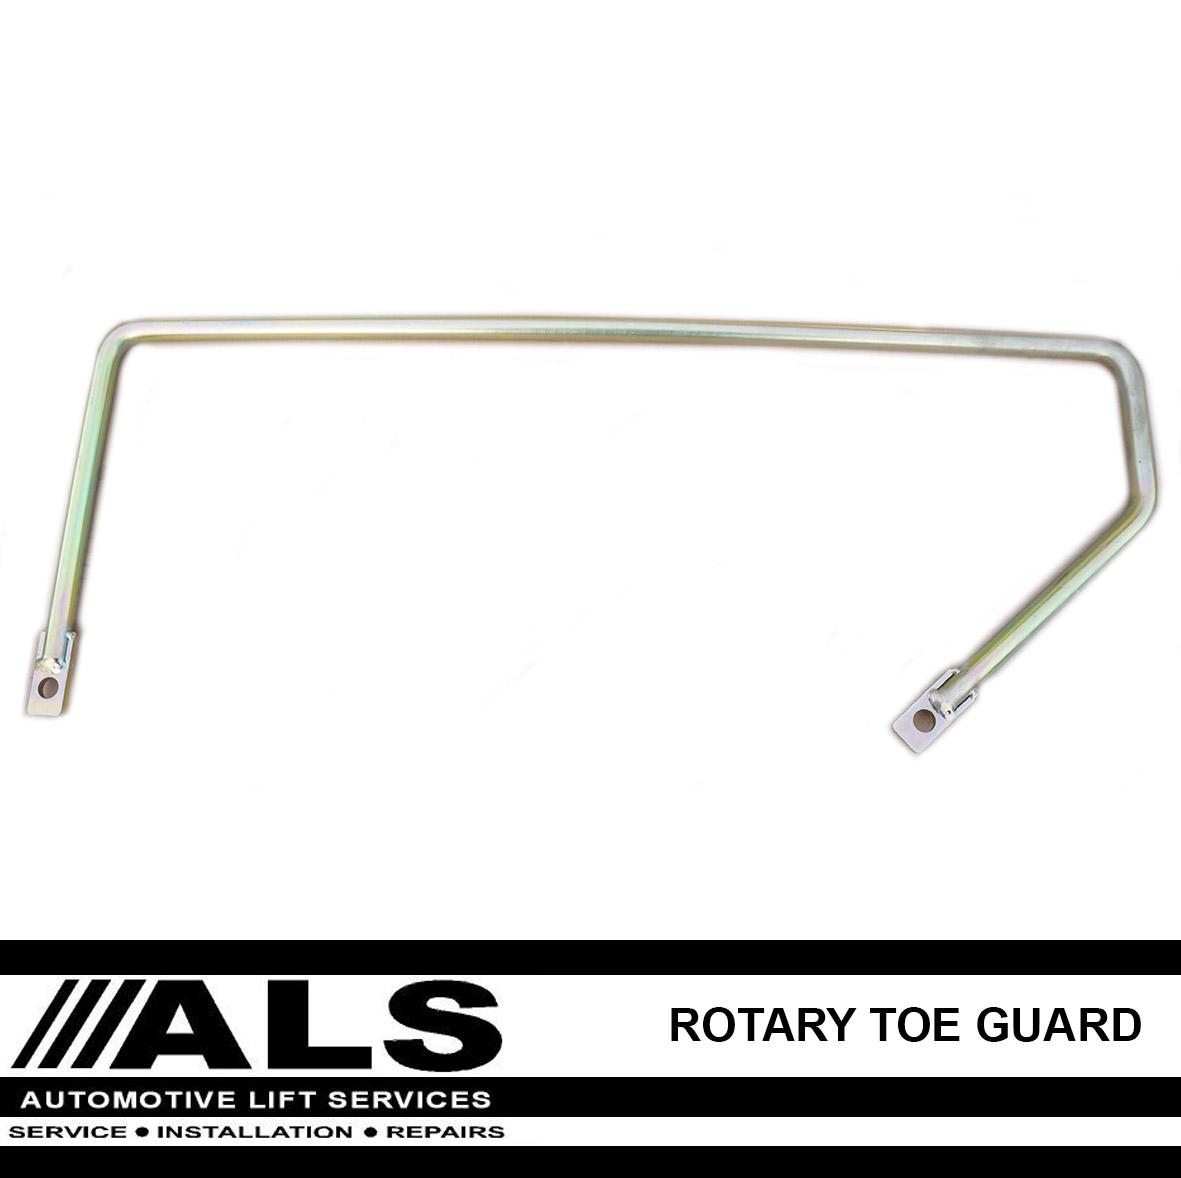 Rotary toe Guard